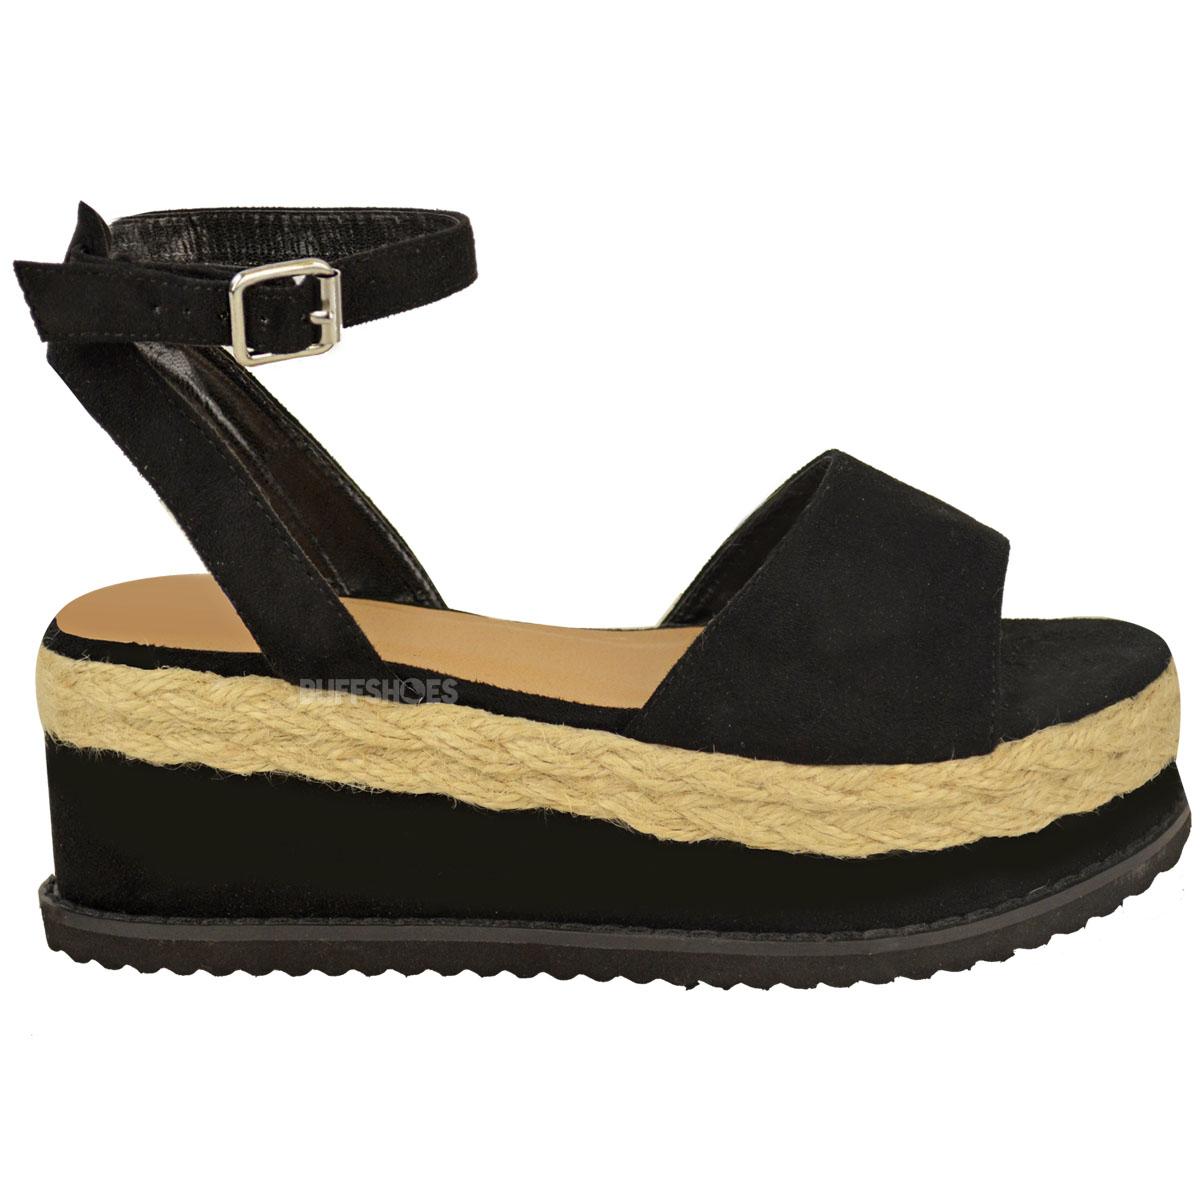 Ladies Wedge Shoes Espadrille